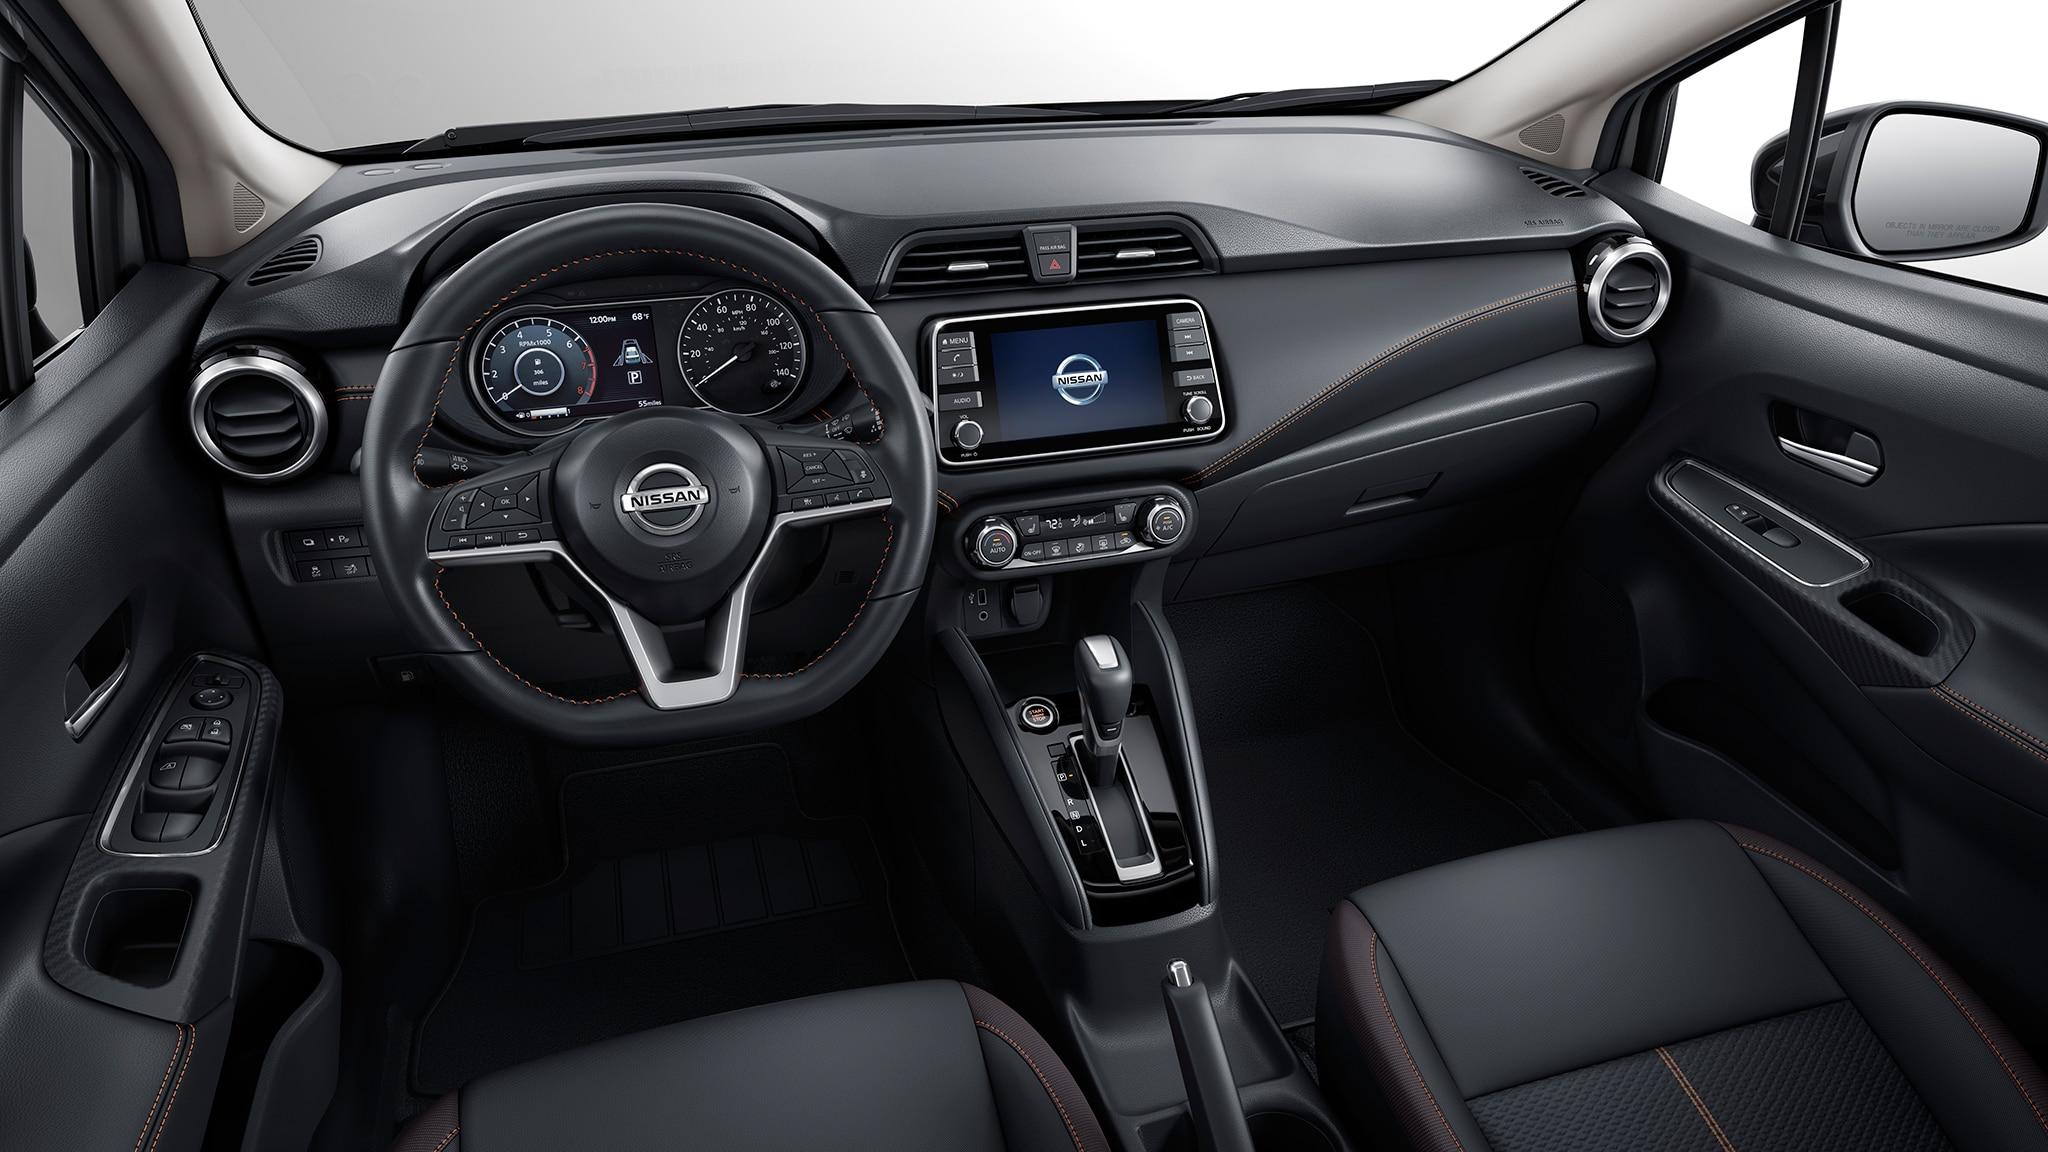 2020 Nissan Versa First Drive Review: Better and Still